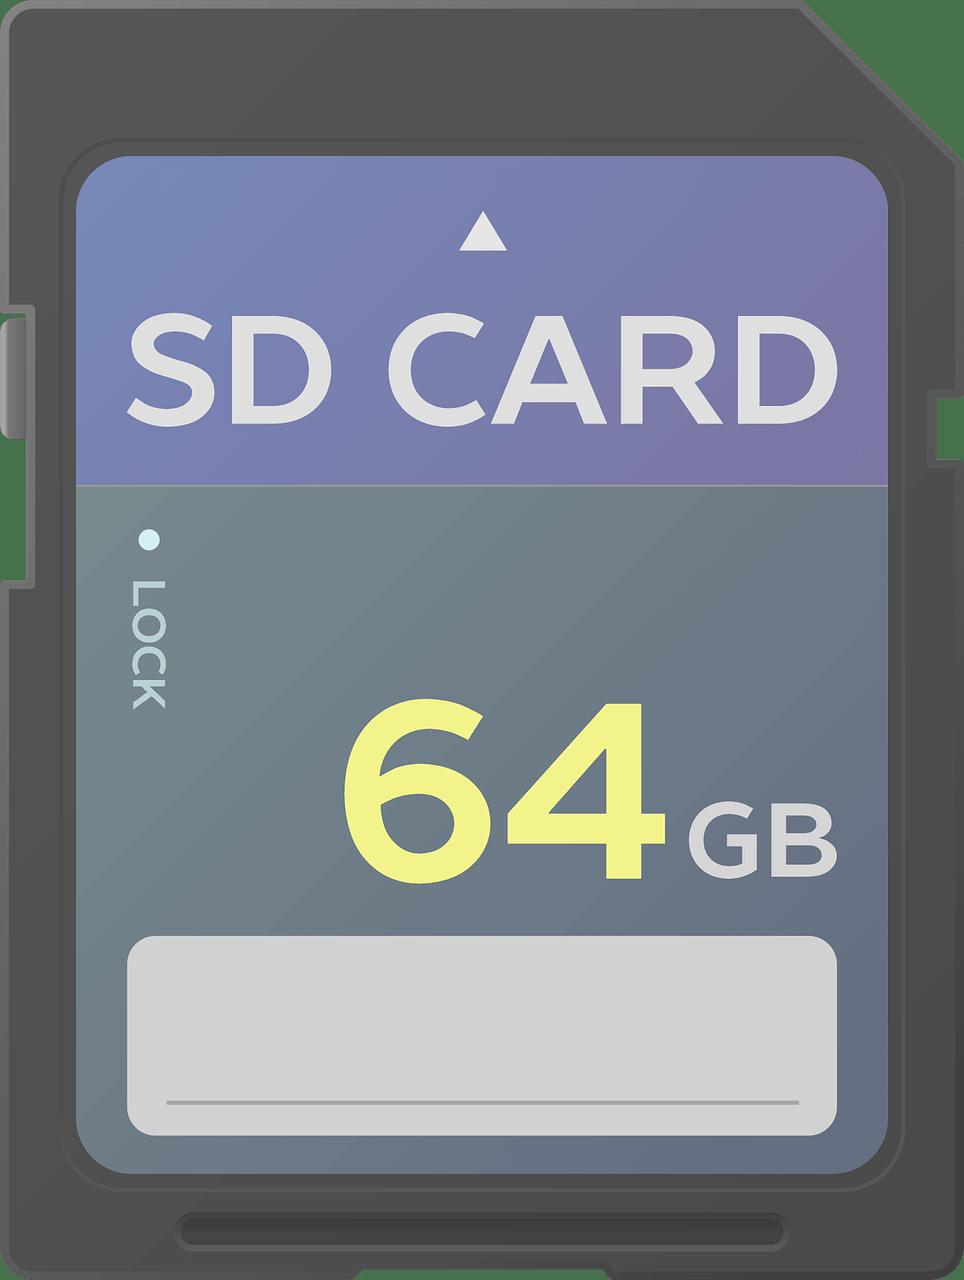 SD Card 64Gb Image